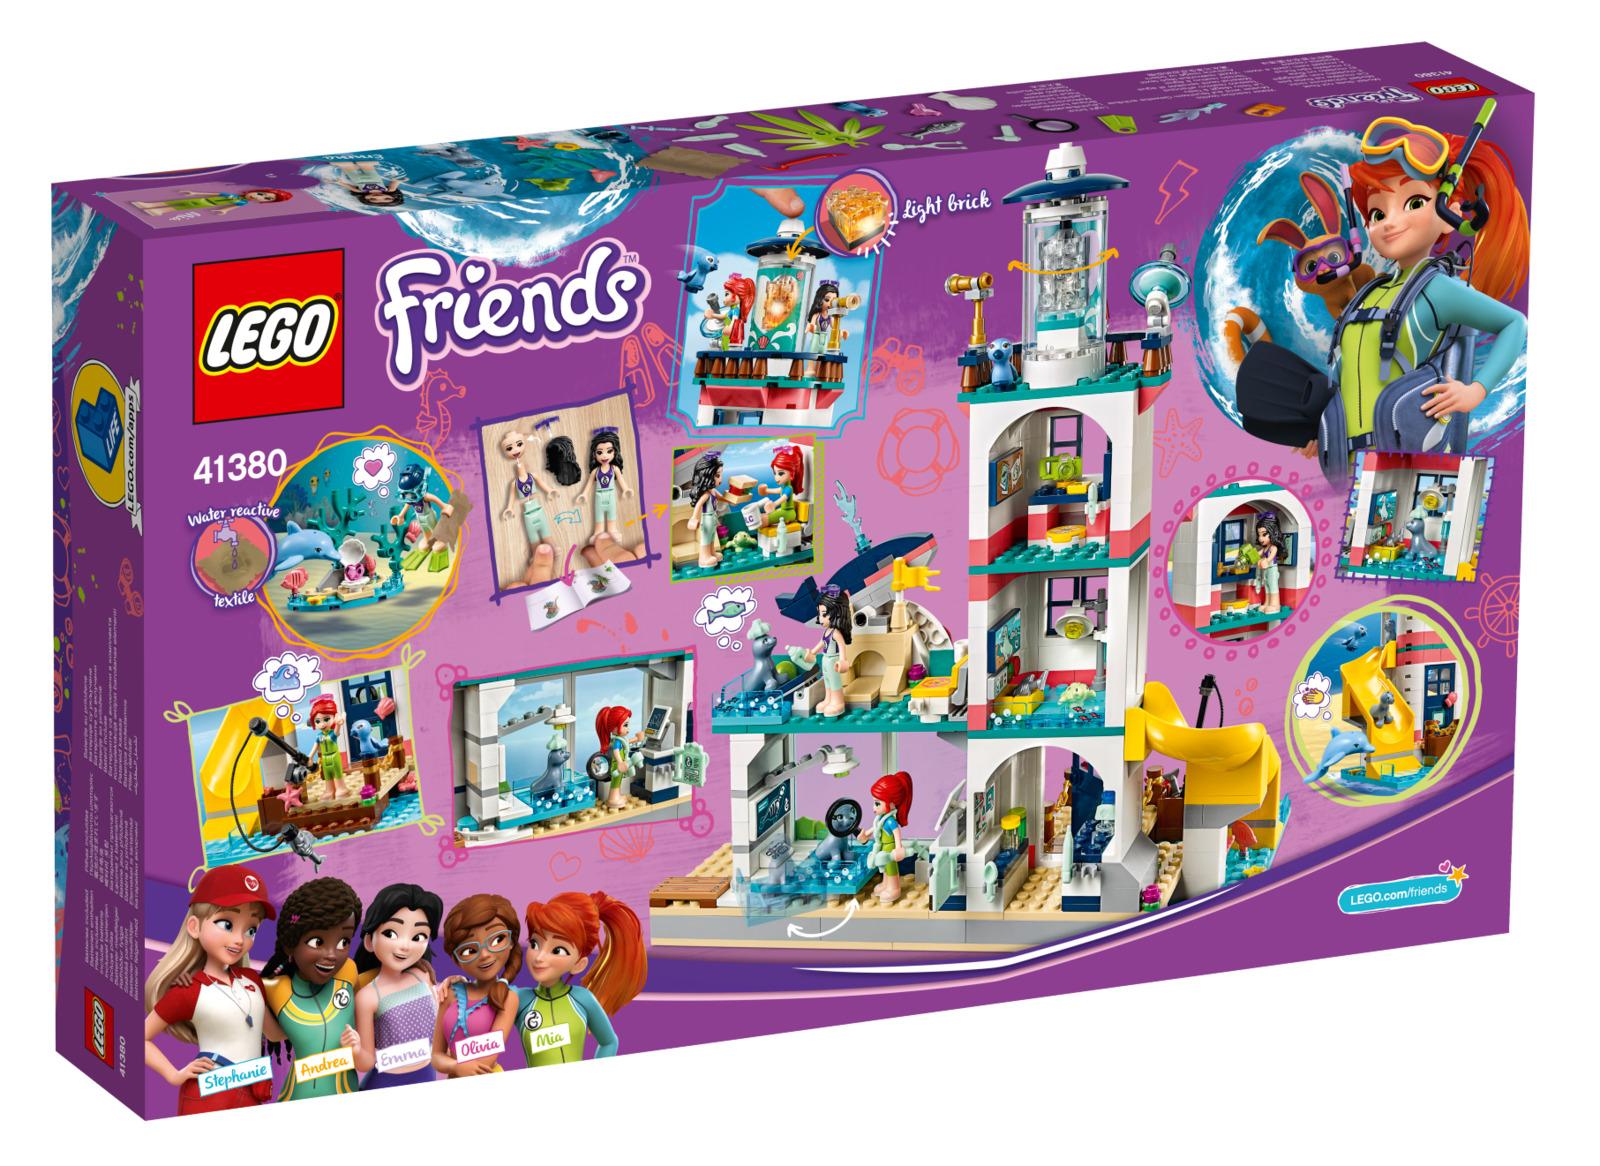 LEGO Friends: Lighthouse Rescue Center - (41380) image